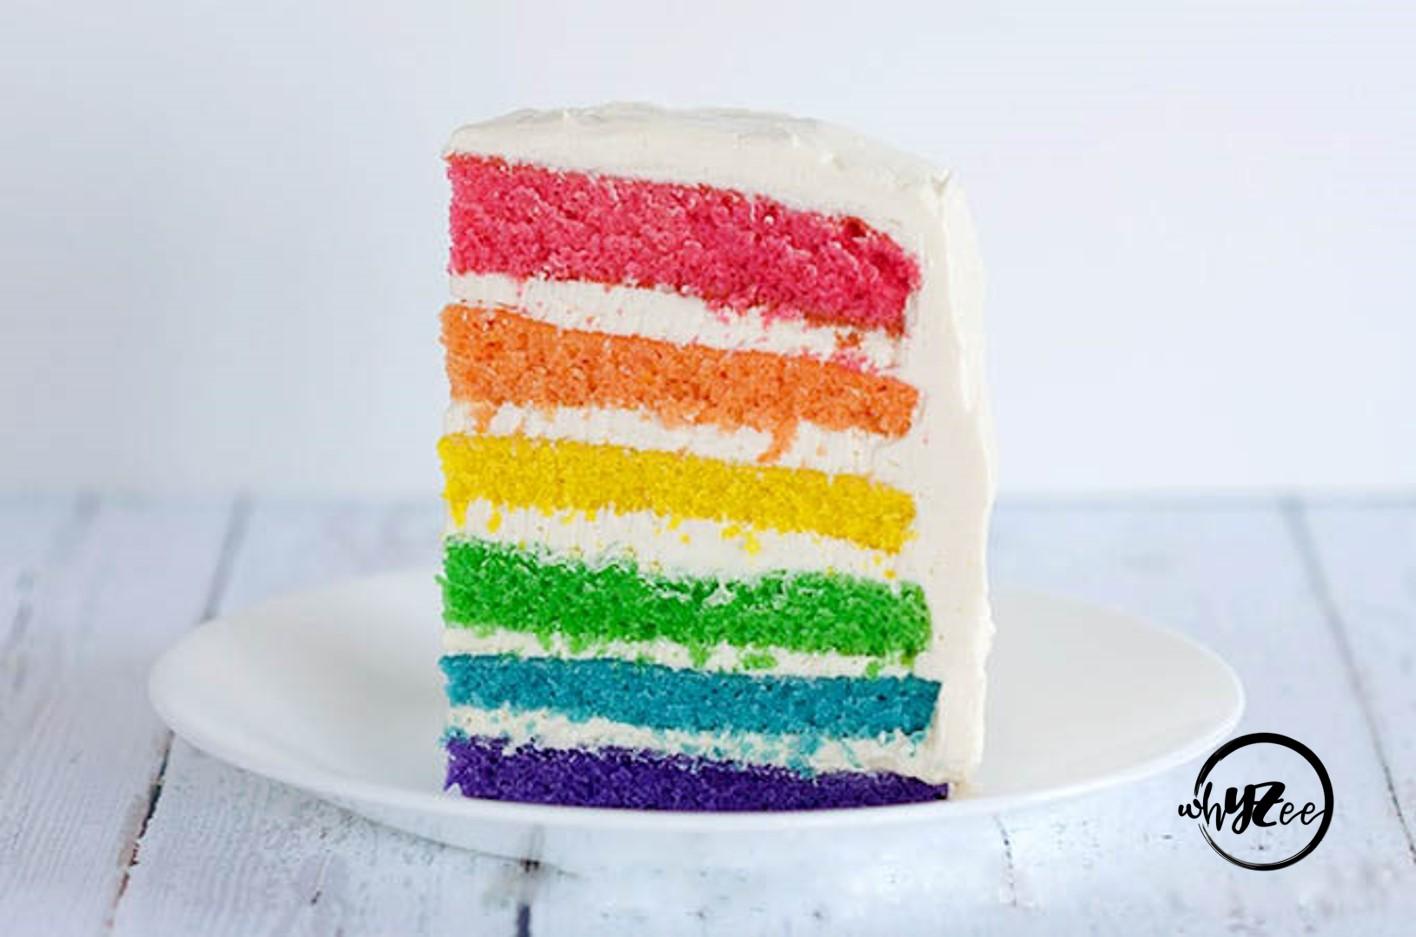 Slice of Rainbow Layer Cake